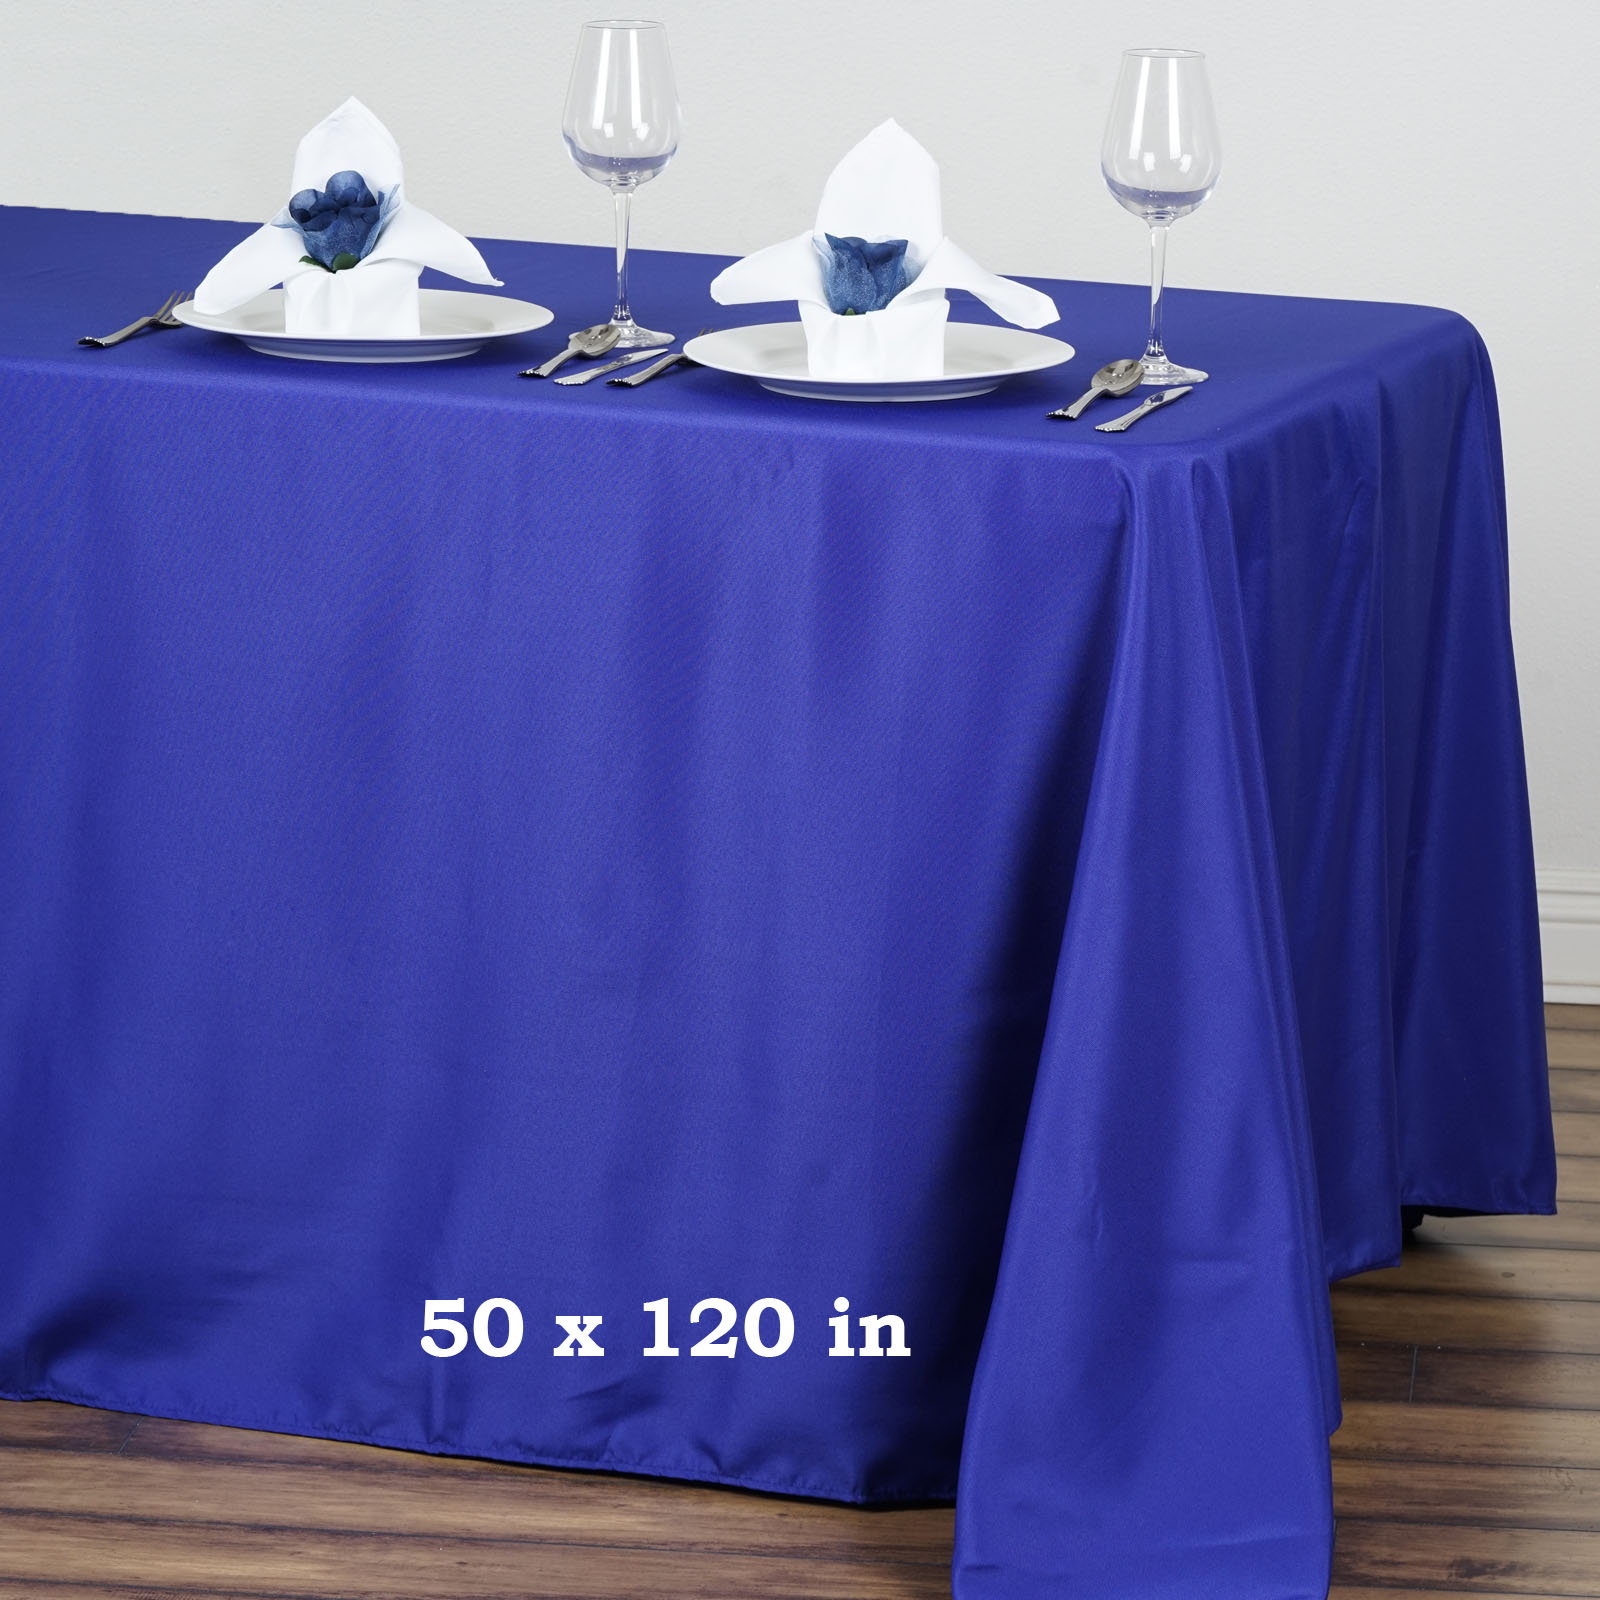 "BalsaCircle 50"" x 120"" Polyester Rectangular Tablecloth Wedding Table Linens by"